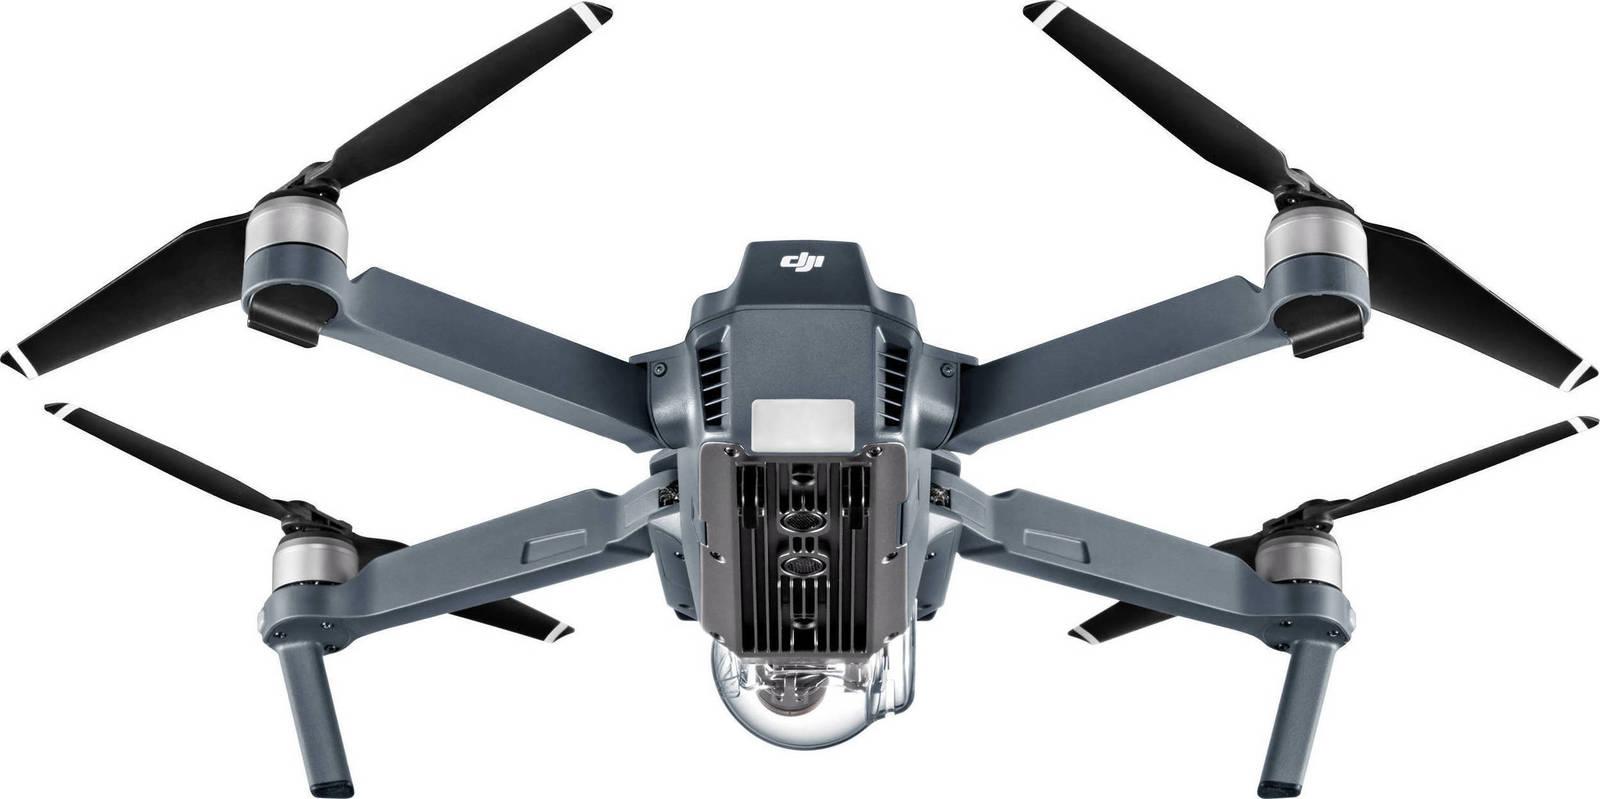 DJI Mavic Pro Drone Πληρωμή έως 12 δόσεις